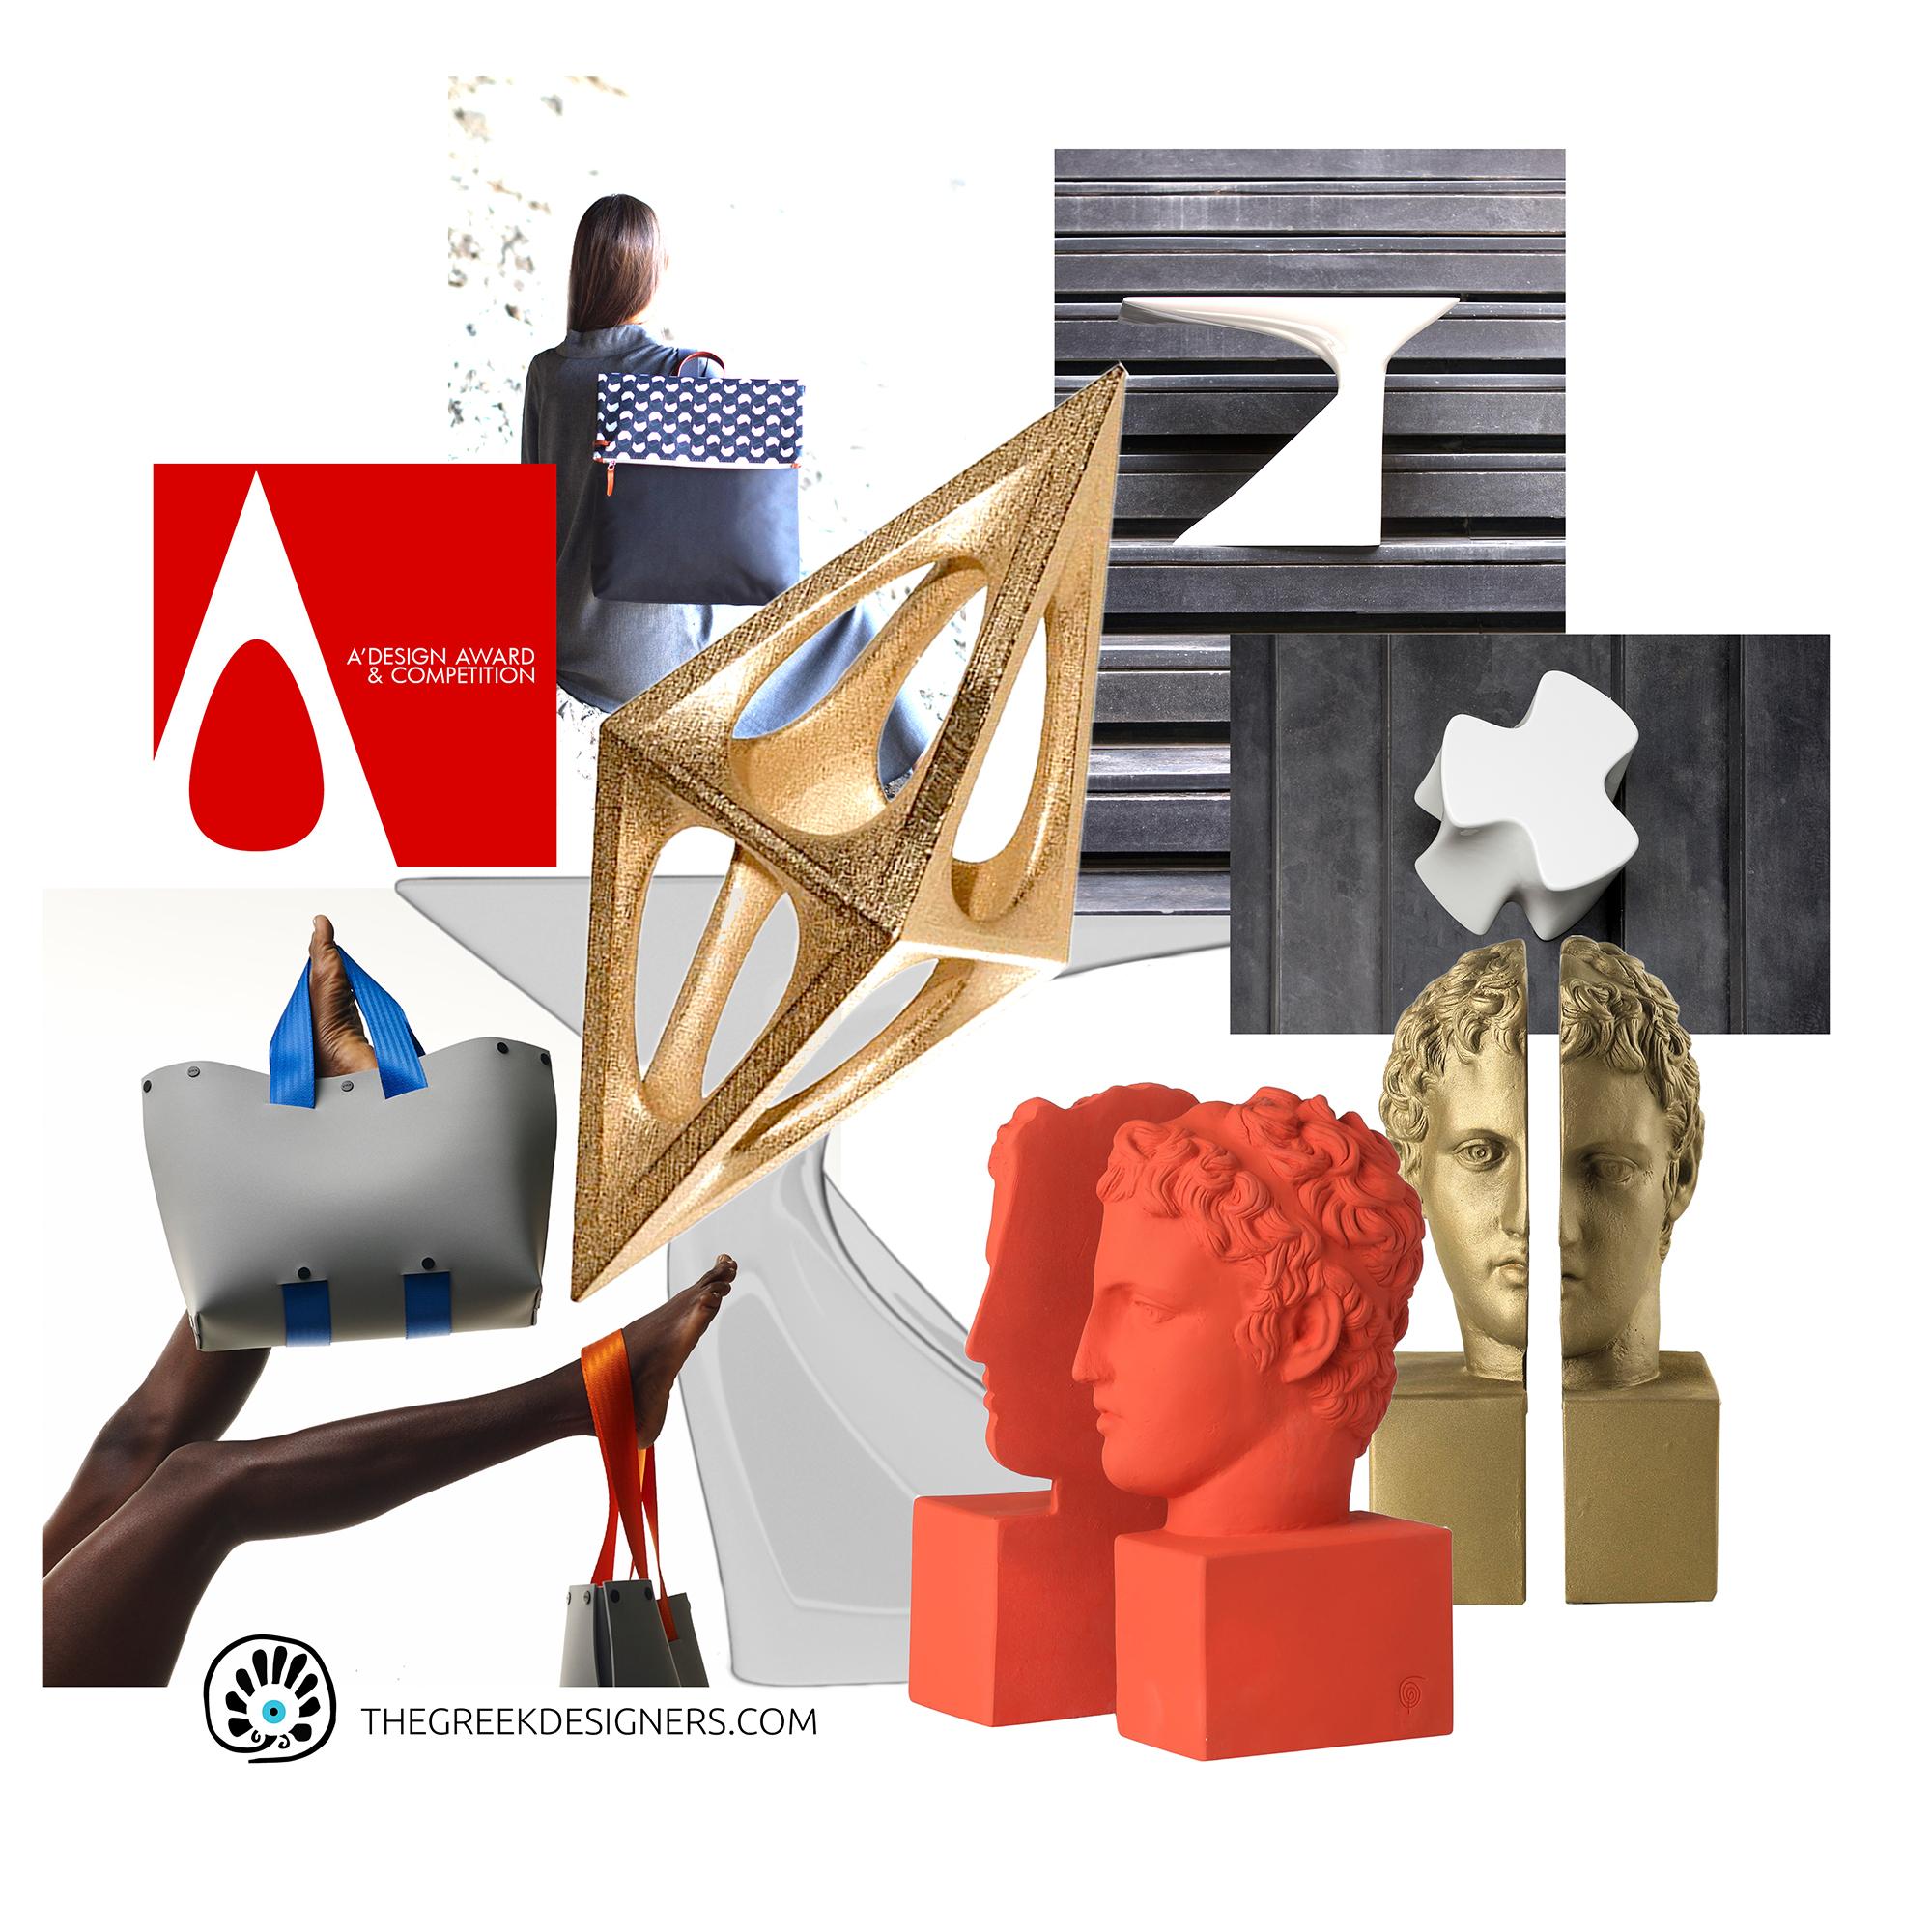 A' Design Awards The Greek Designers